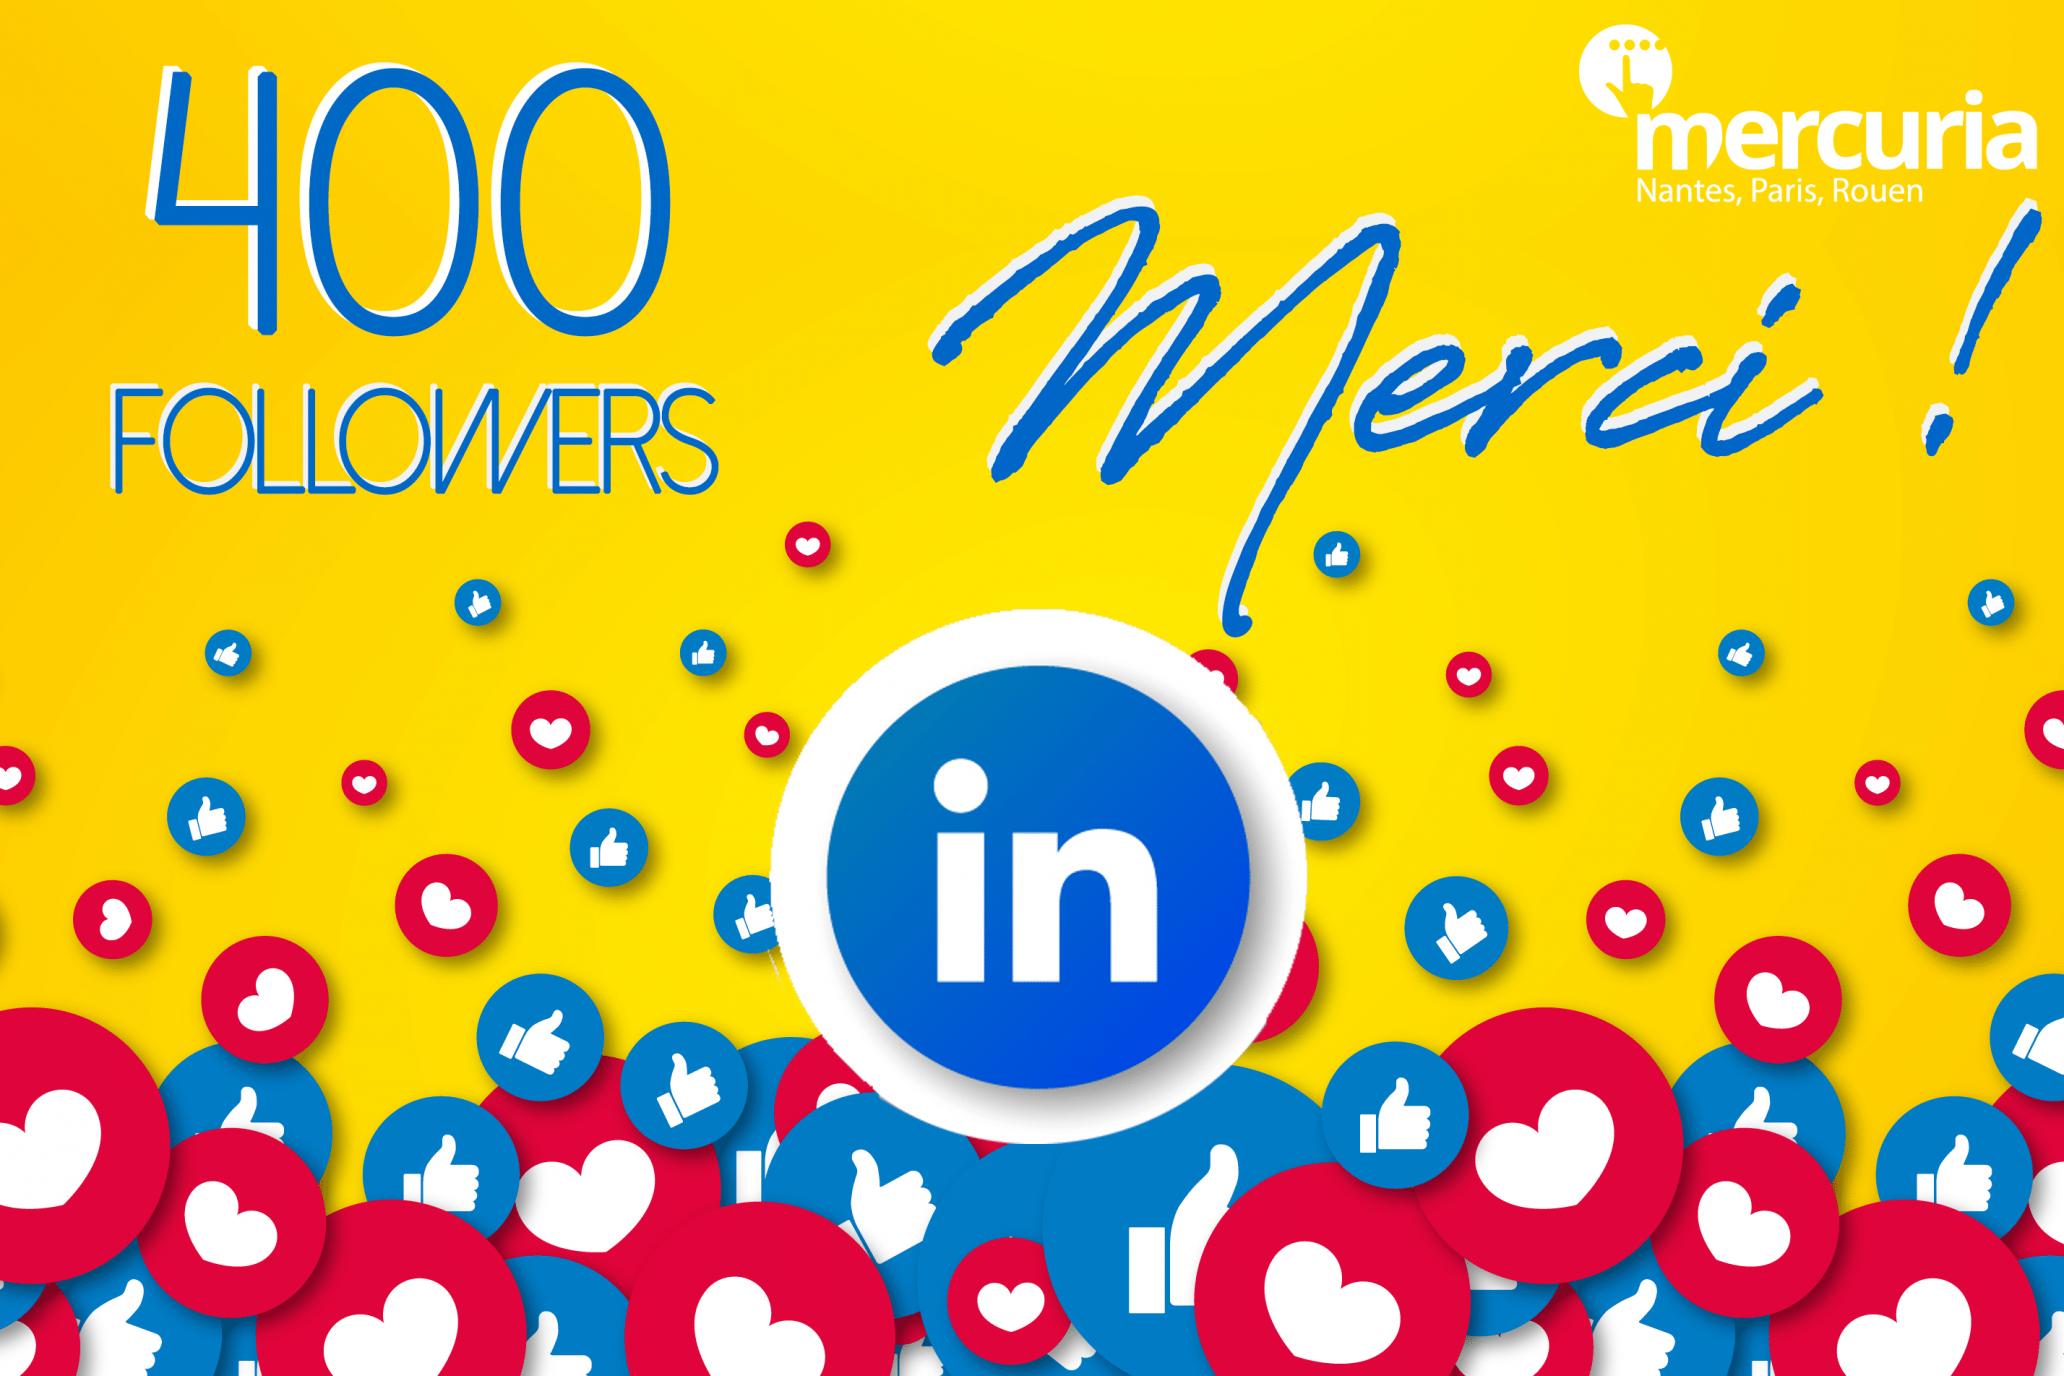 400-followers-linkedin_mercuria